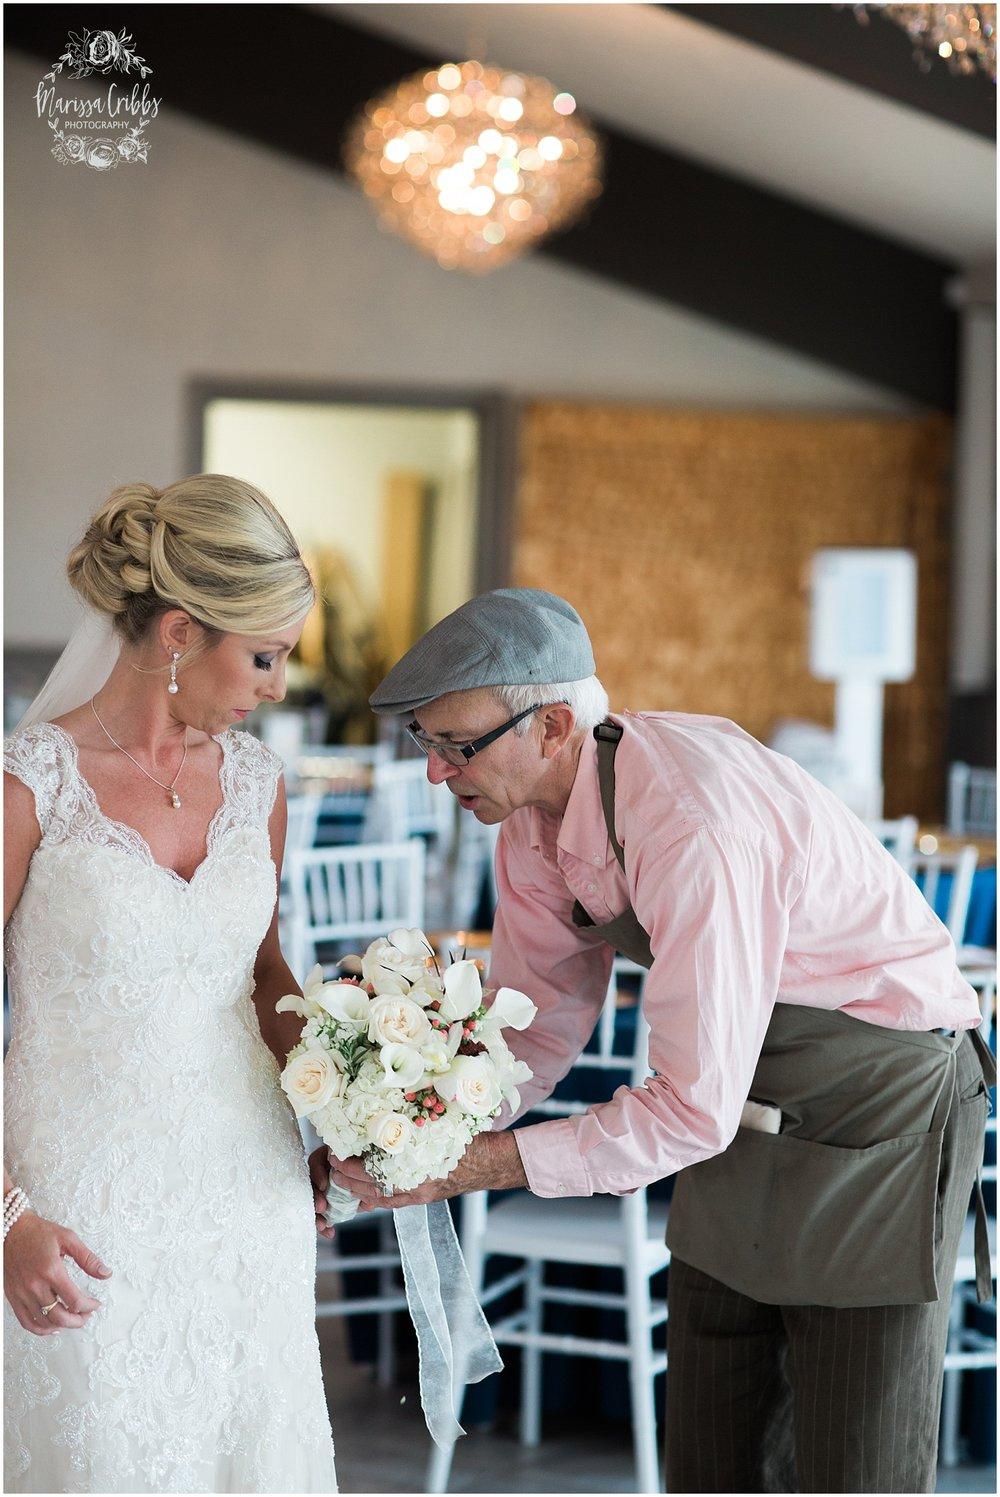 Alex & Amie | Eighteen Ninety Event Space | Marissa Cribbs Photography | Kansas City Perfect Wedding Guide_1281.jpg